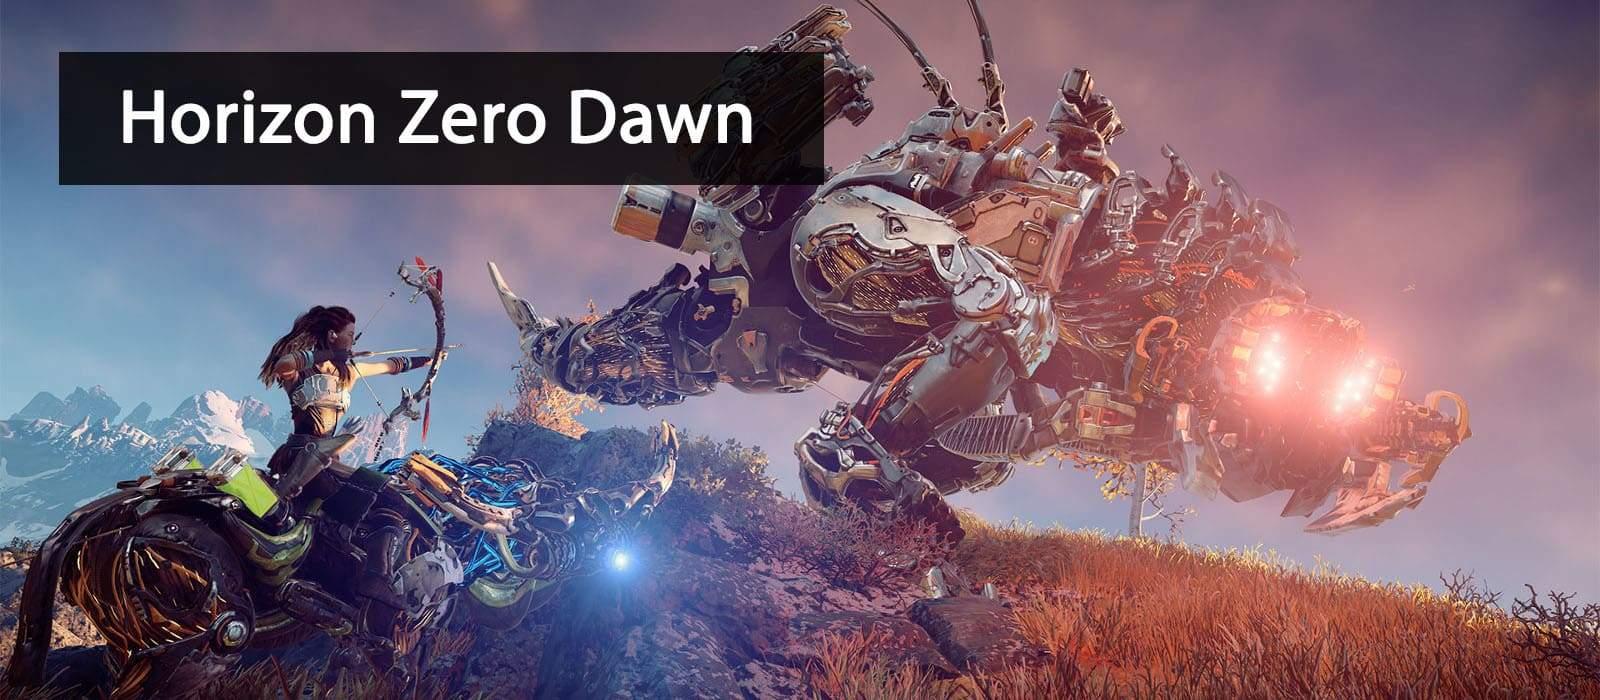 Sony PlayStation 4 Pro Game Horizon Zero Dawn